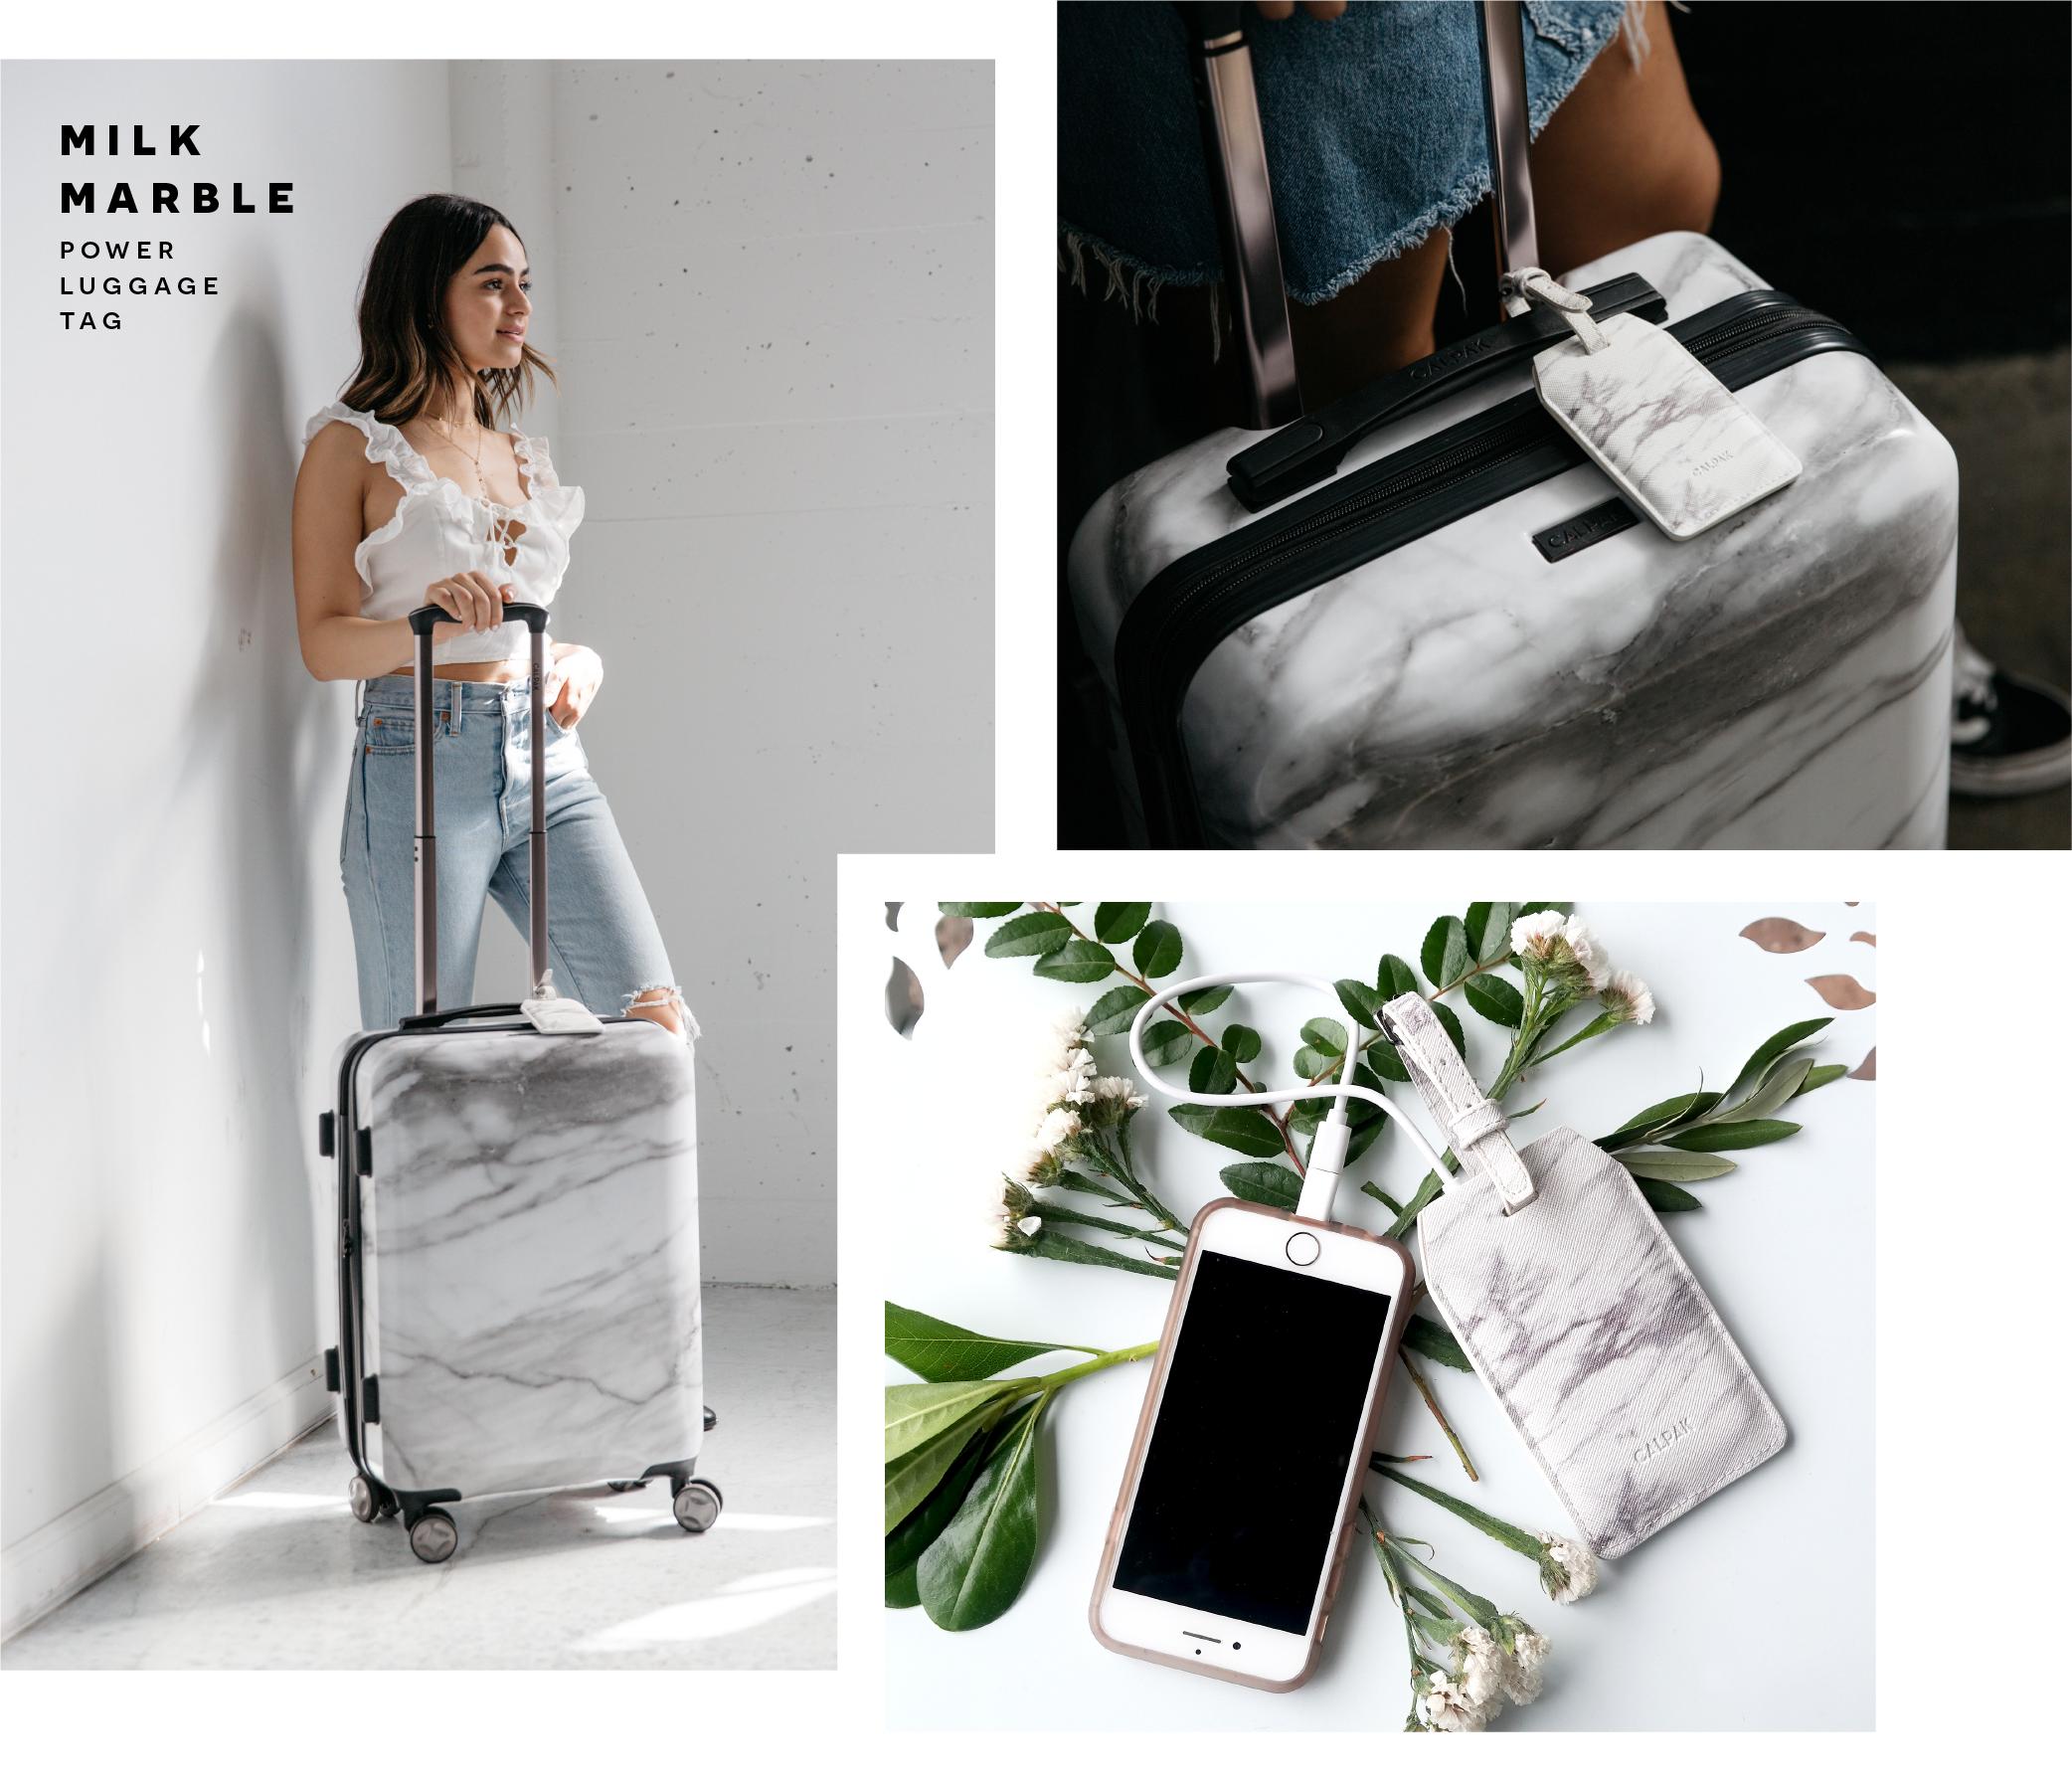 Photos of CALPAK's Milk Marble Power Luggage Tag